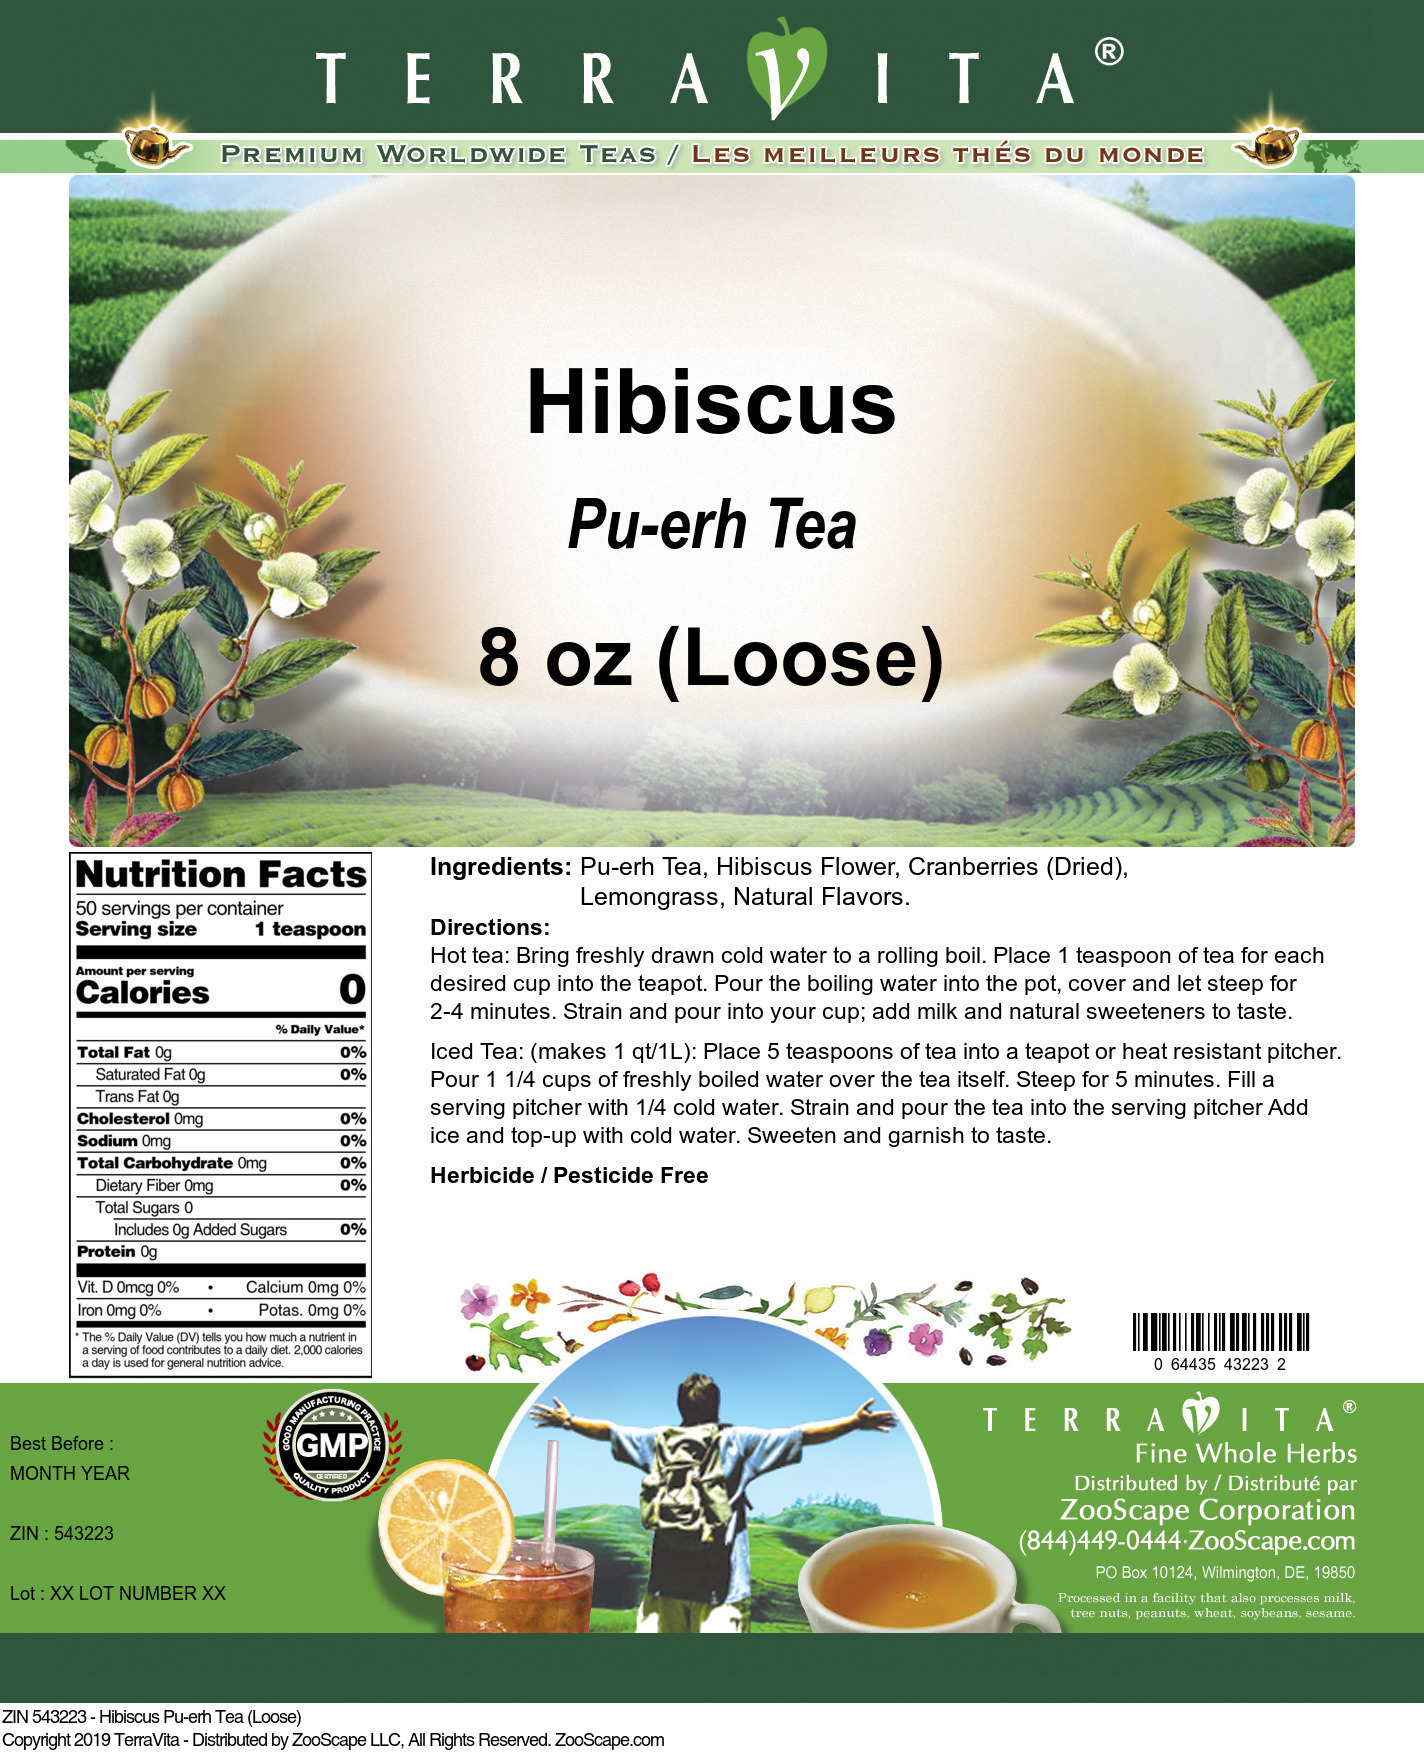 Hibiscus Pu-erh Tea (Loose)